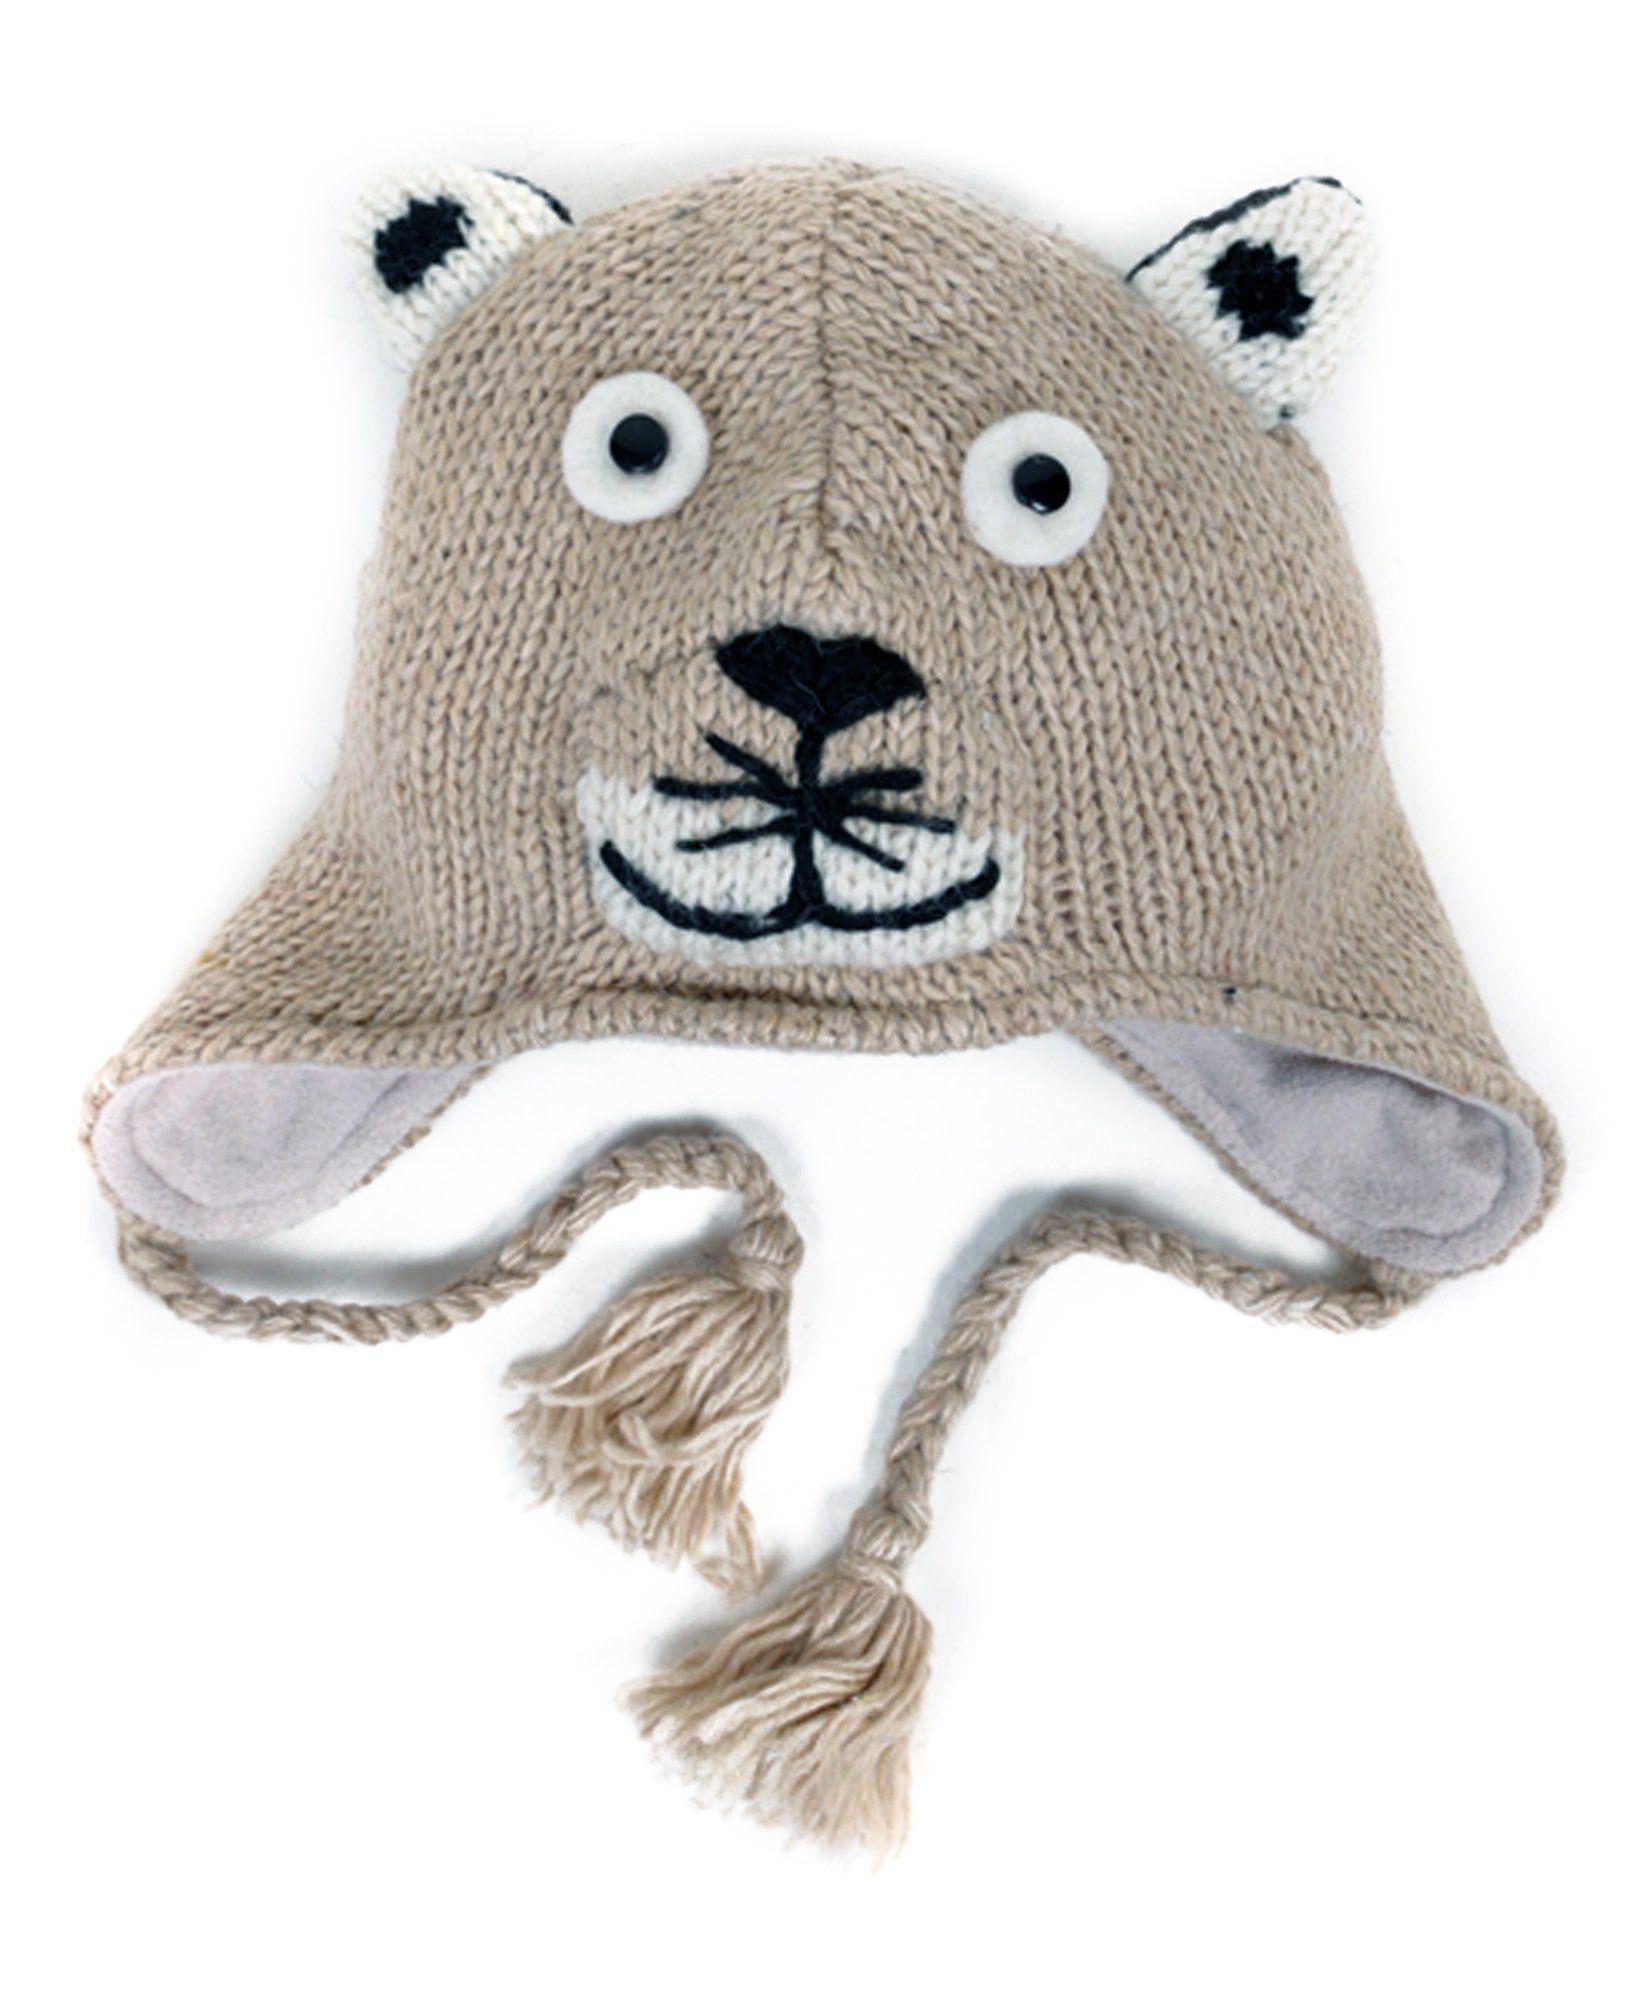 Amazon.com  100% Wool  Hat-imals  Plush Knit Winter Hats (Wool ... 537eb59613d4